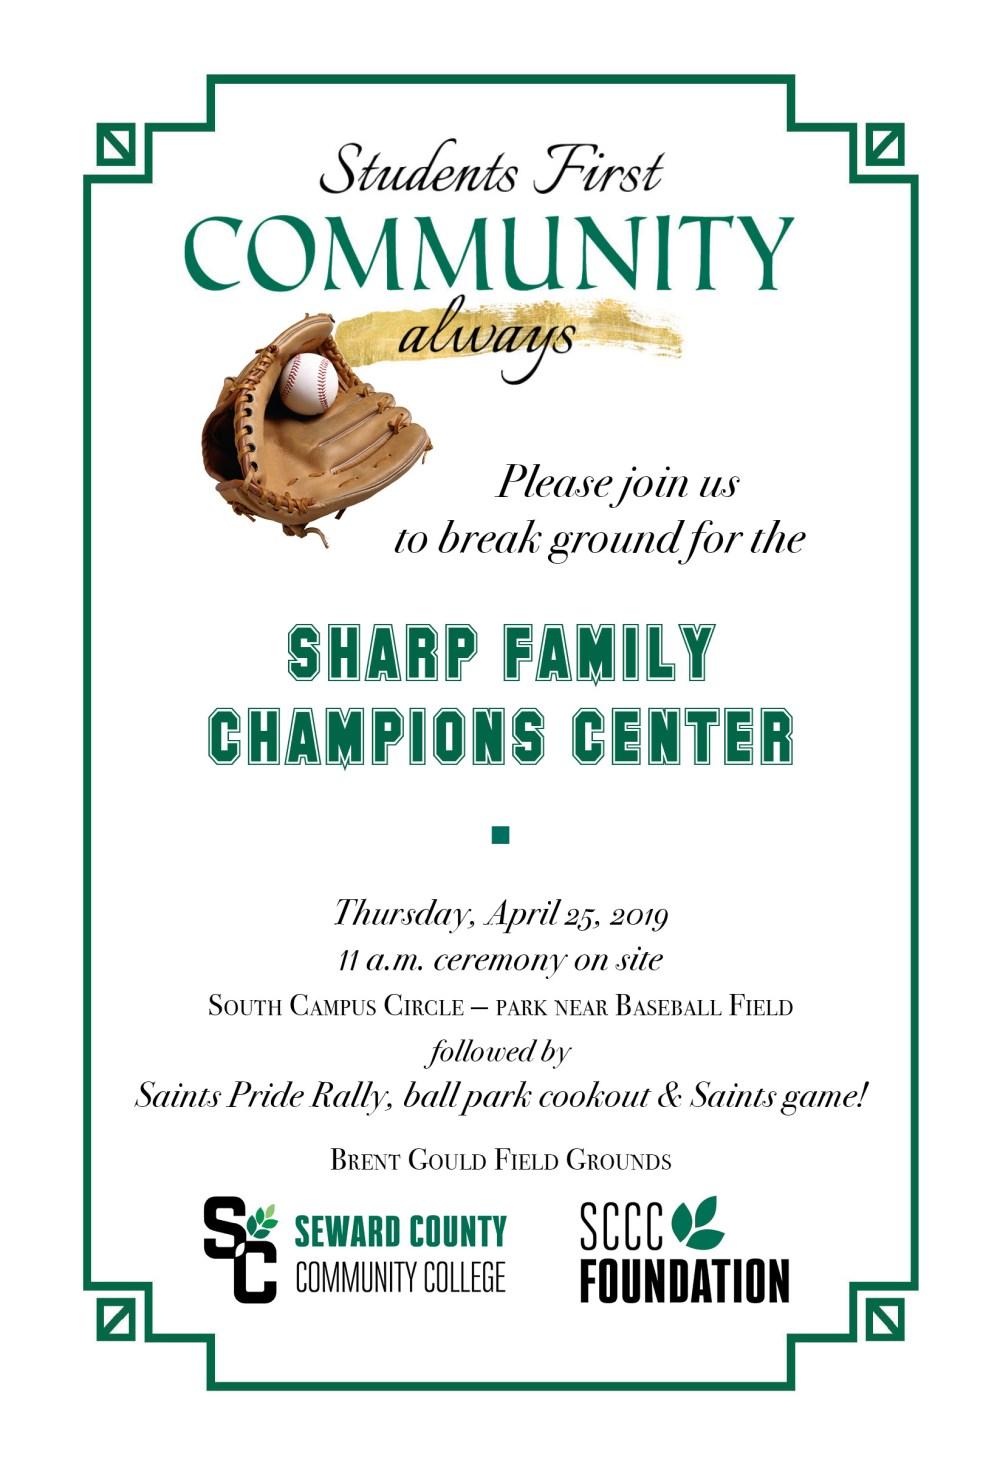 Champions Center invite for DIGITAL sharing